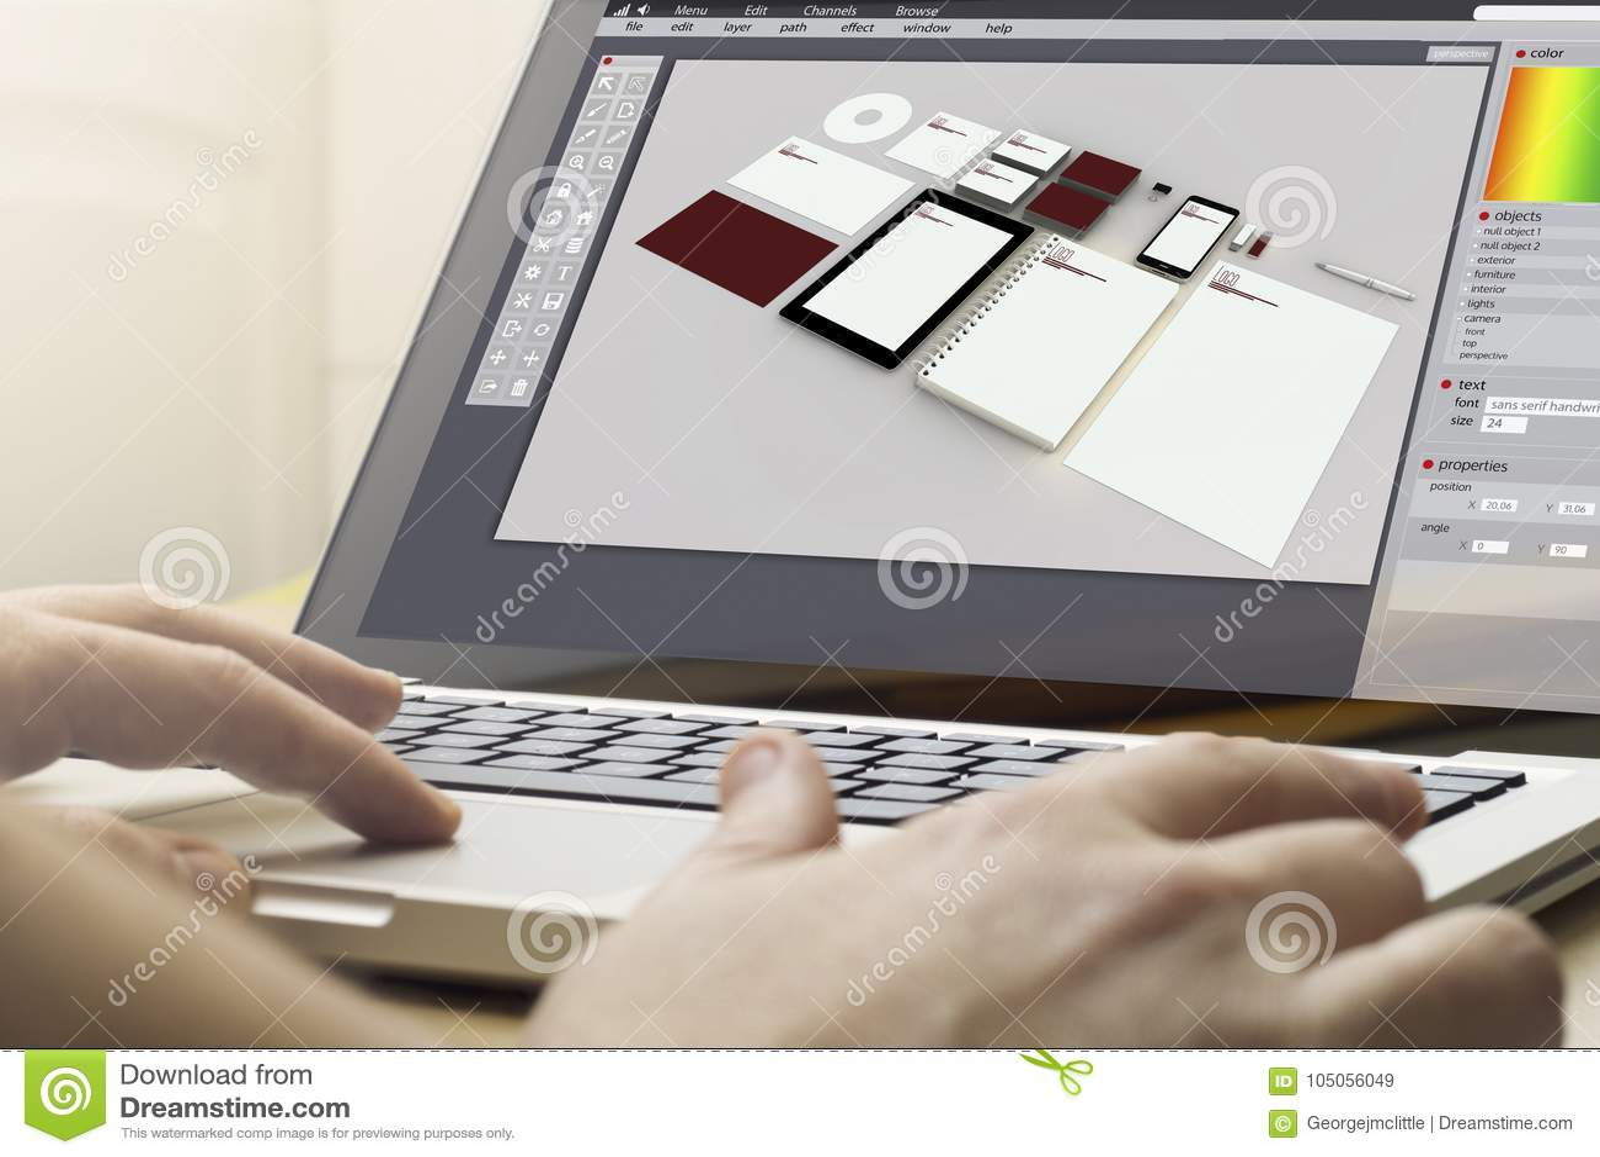 Home Computing Branding